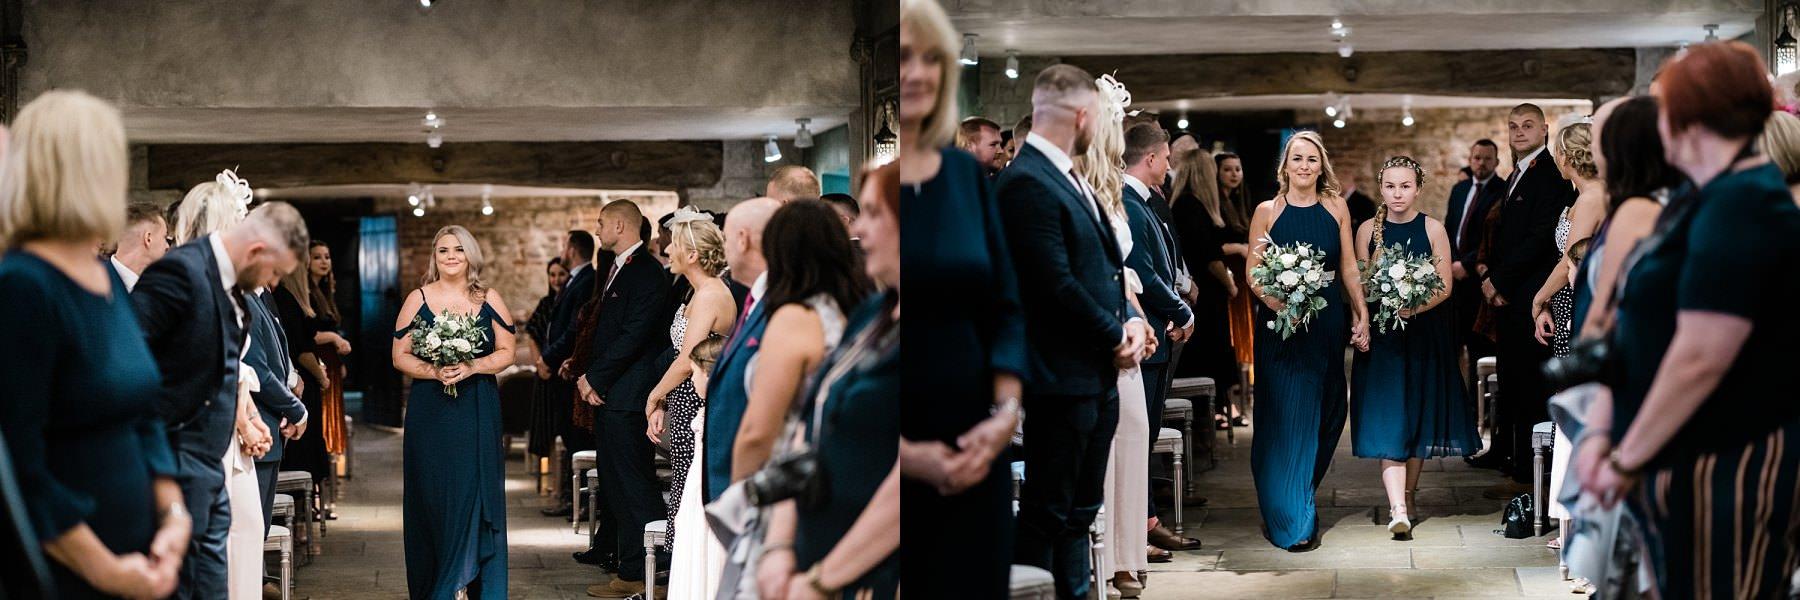 Bridesmaids walking down the aisle Le petite Chateau wedding - North East Wedding Photographer